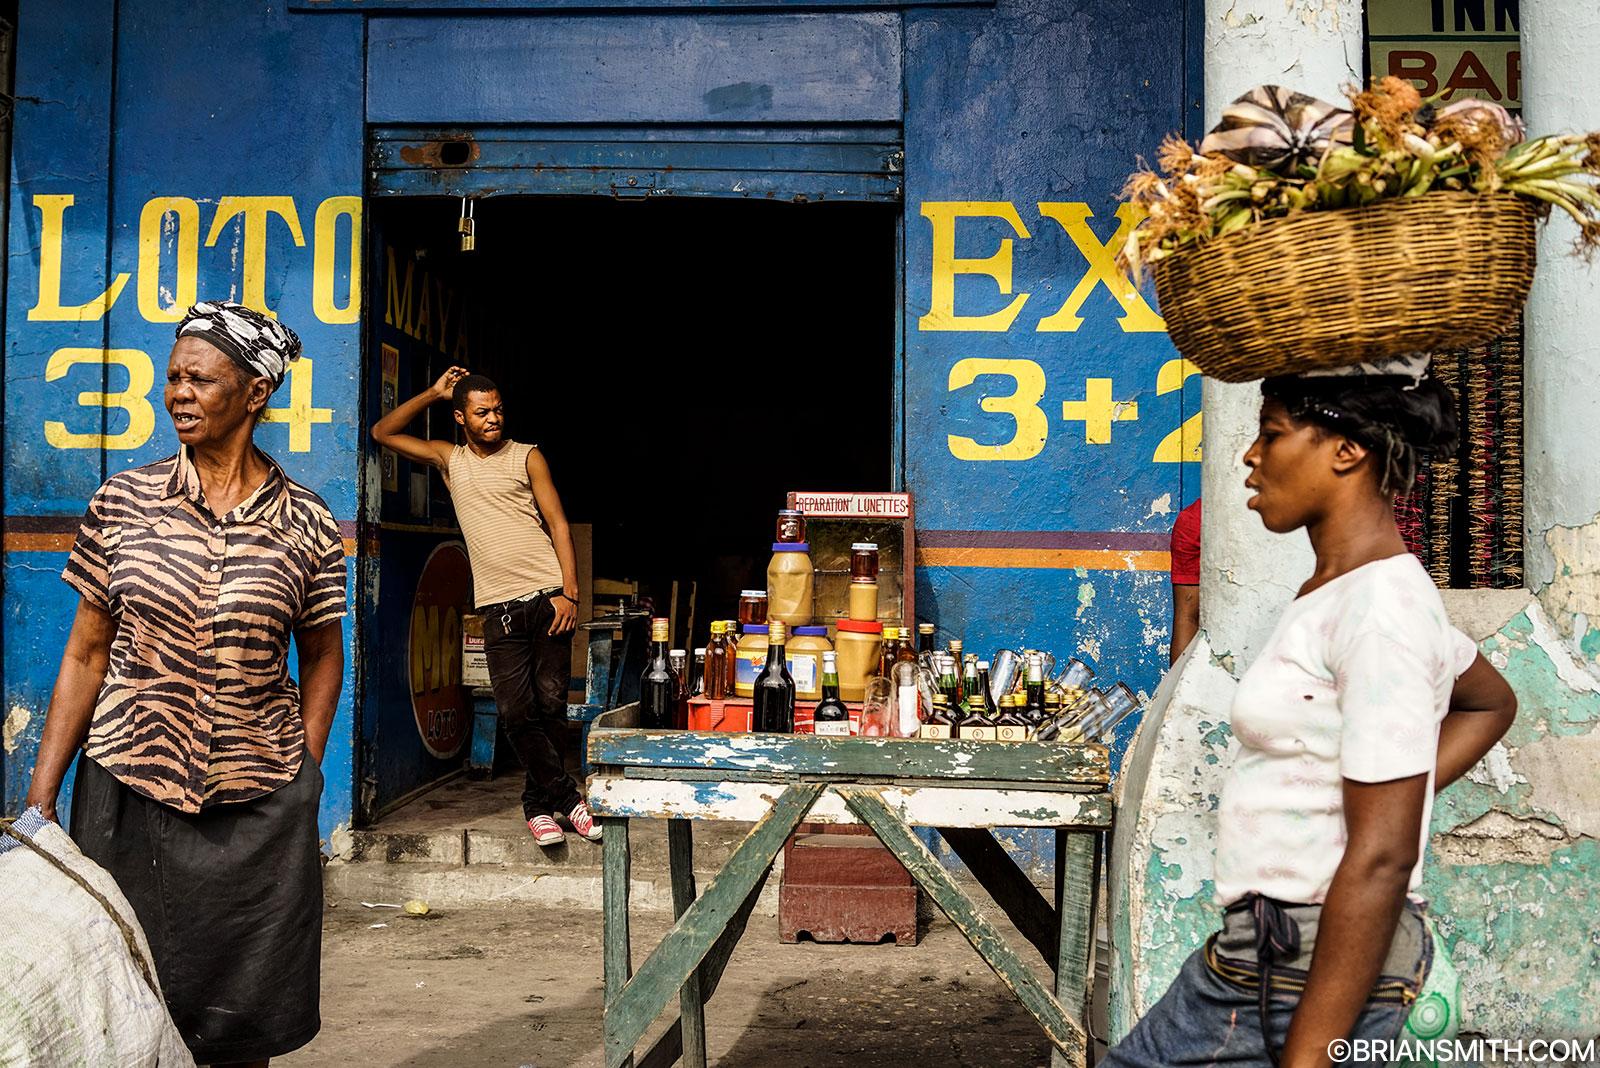 Sony a7r camera with zeiss fe 35 za lens street photography haiti